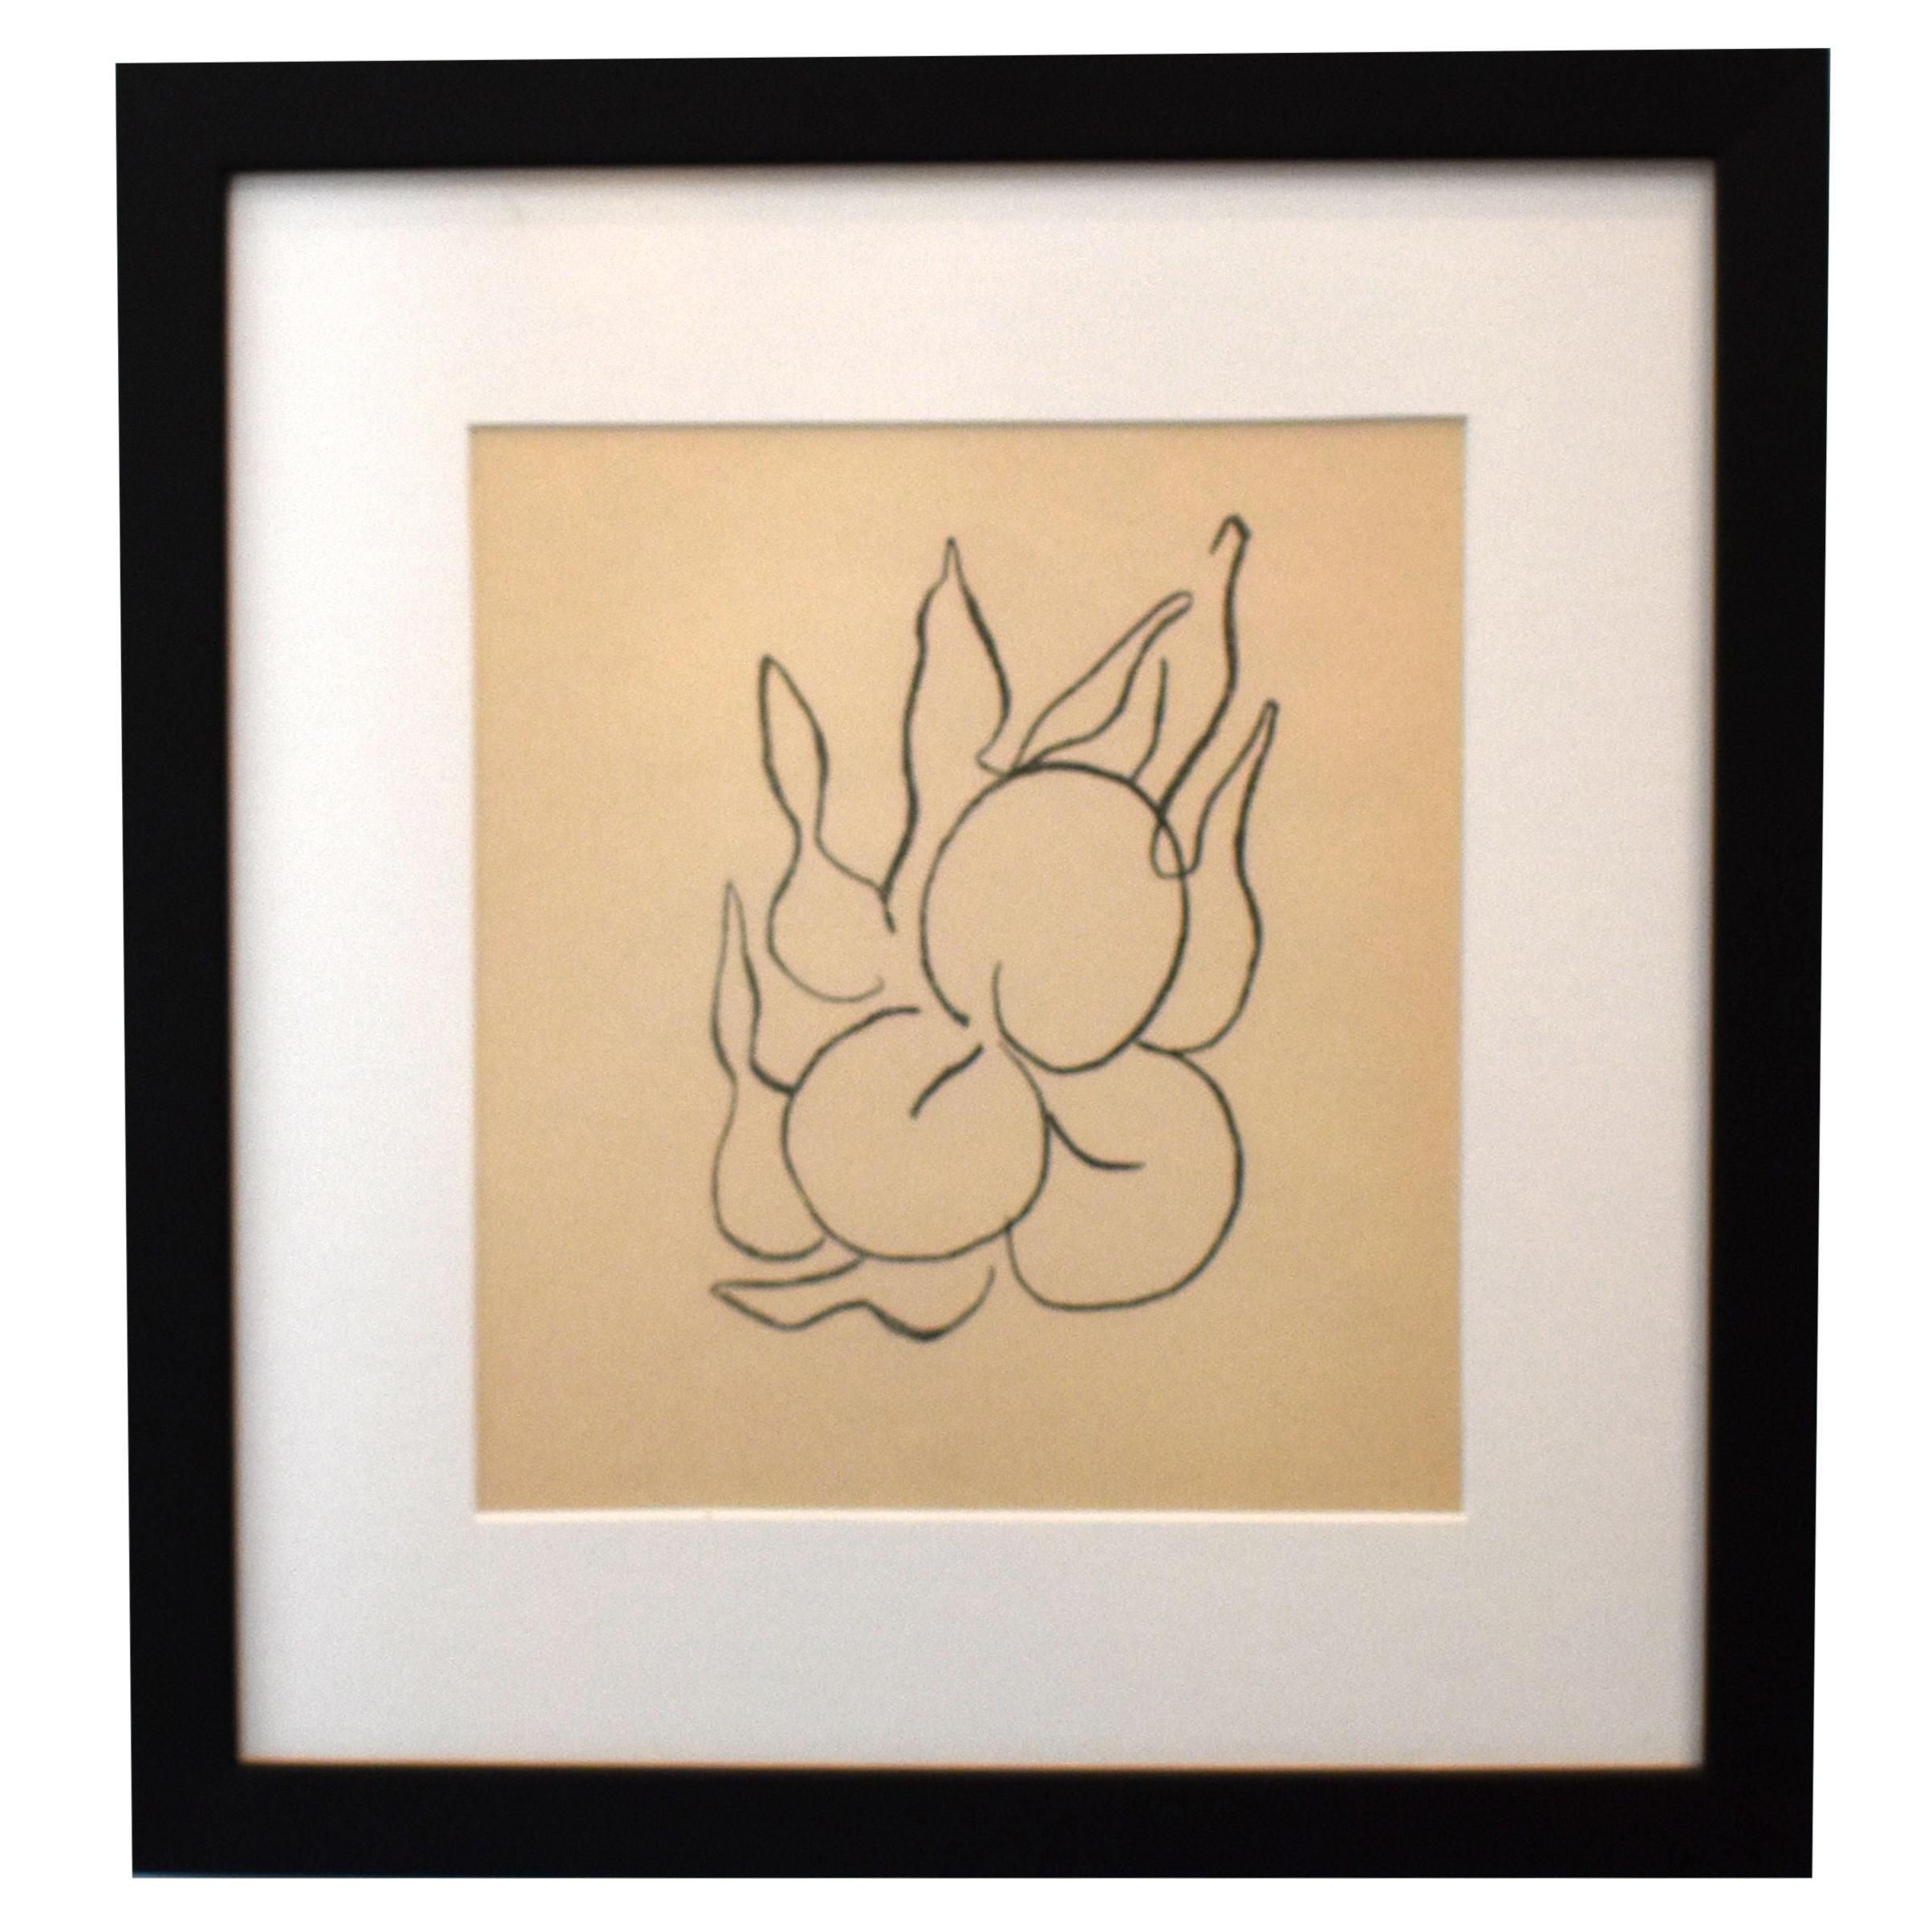 "Henri Matisse ""Fruits"" Black & White Lithograph by Henri Matisse"